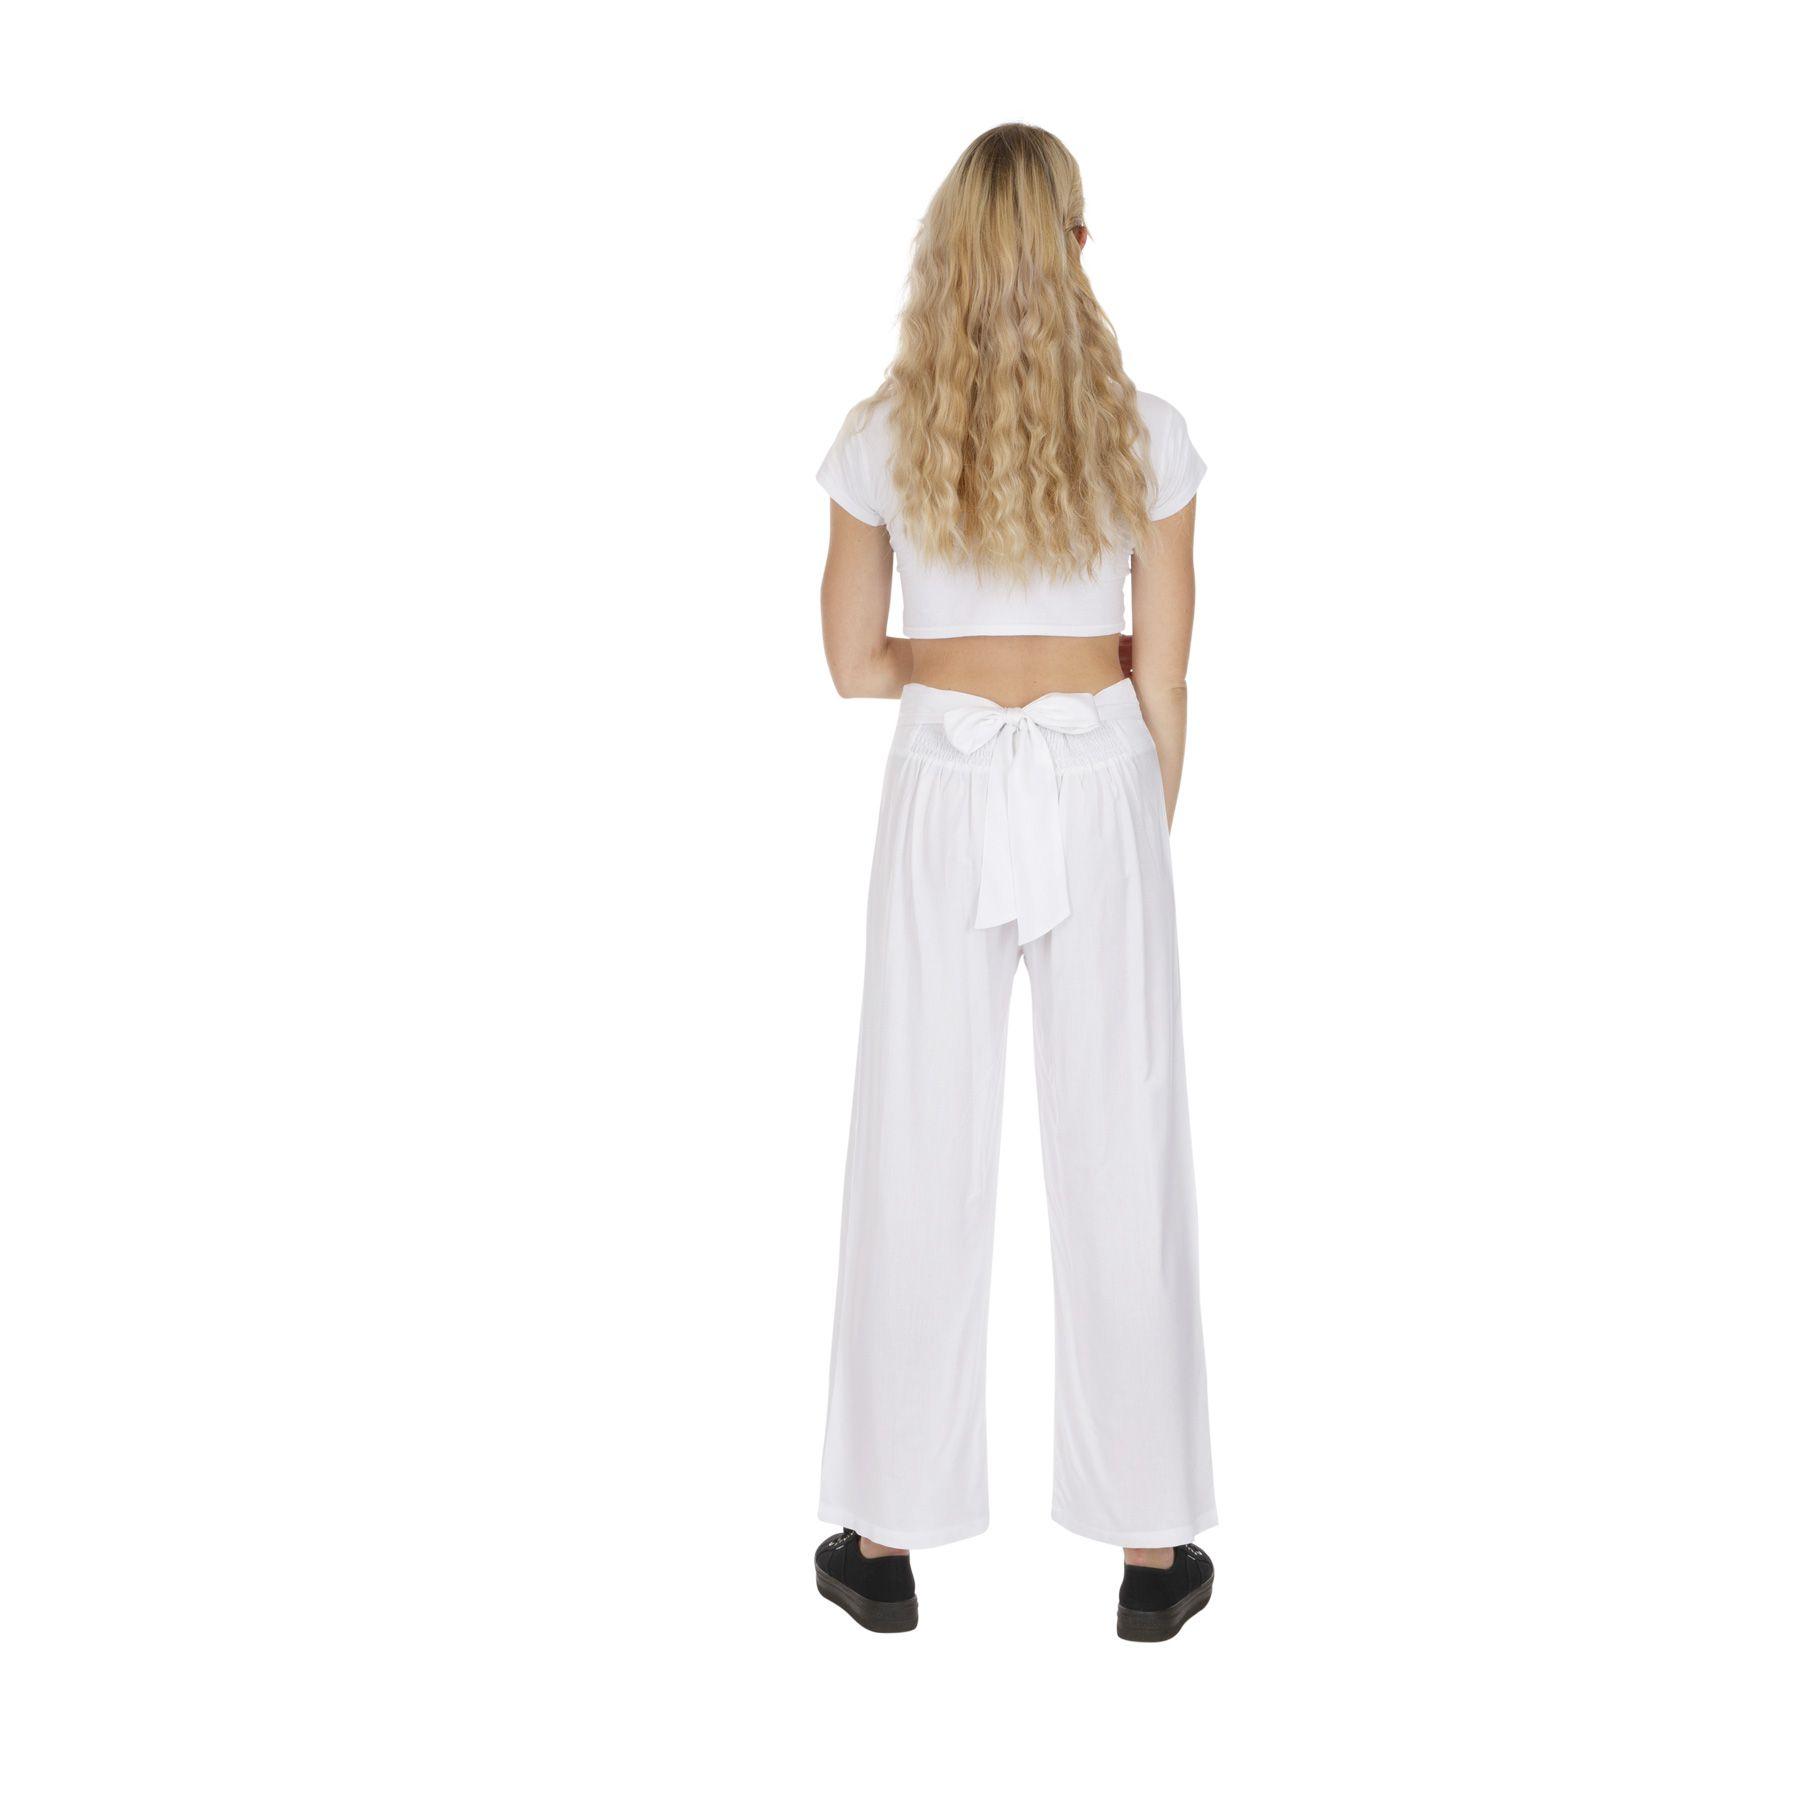 pantalon blanc femme tenue mariage chic pas cher Friendly 318393